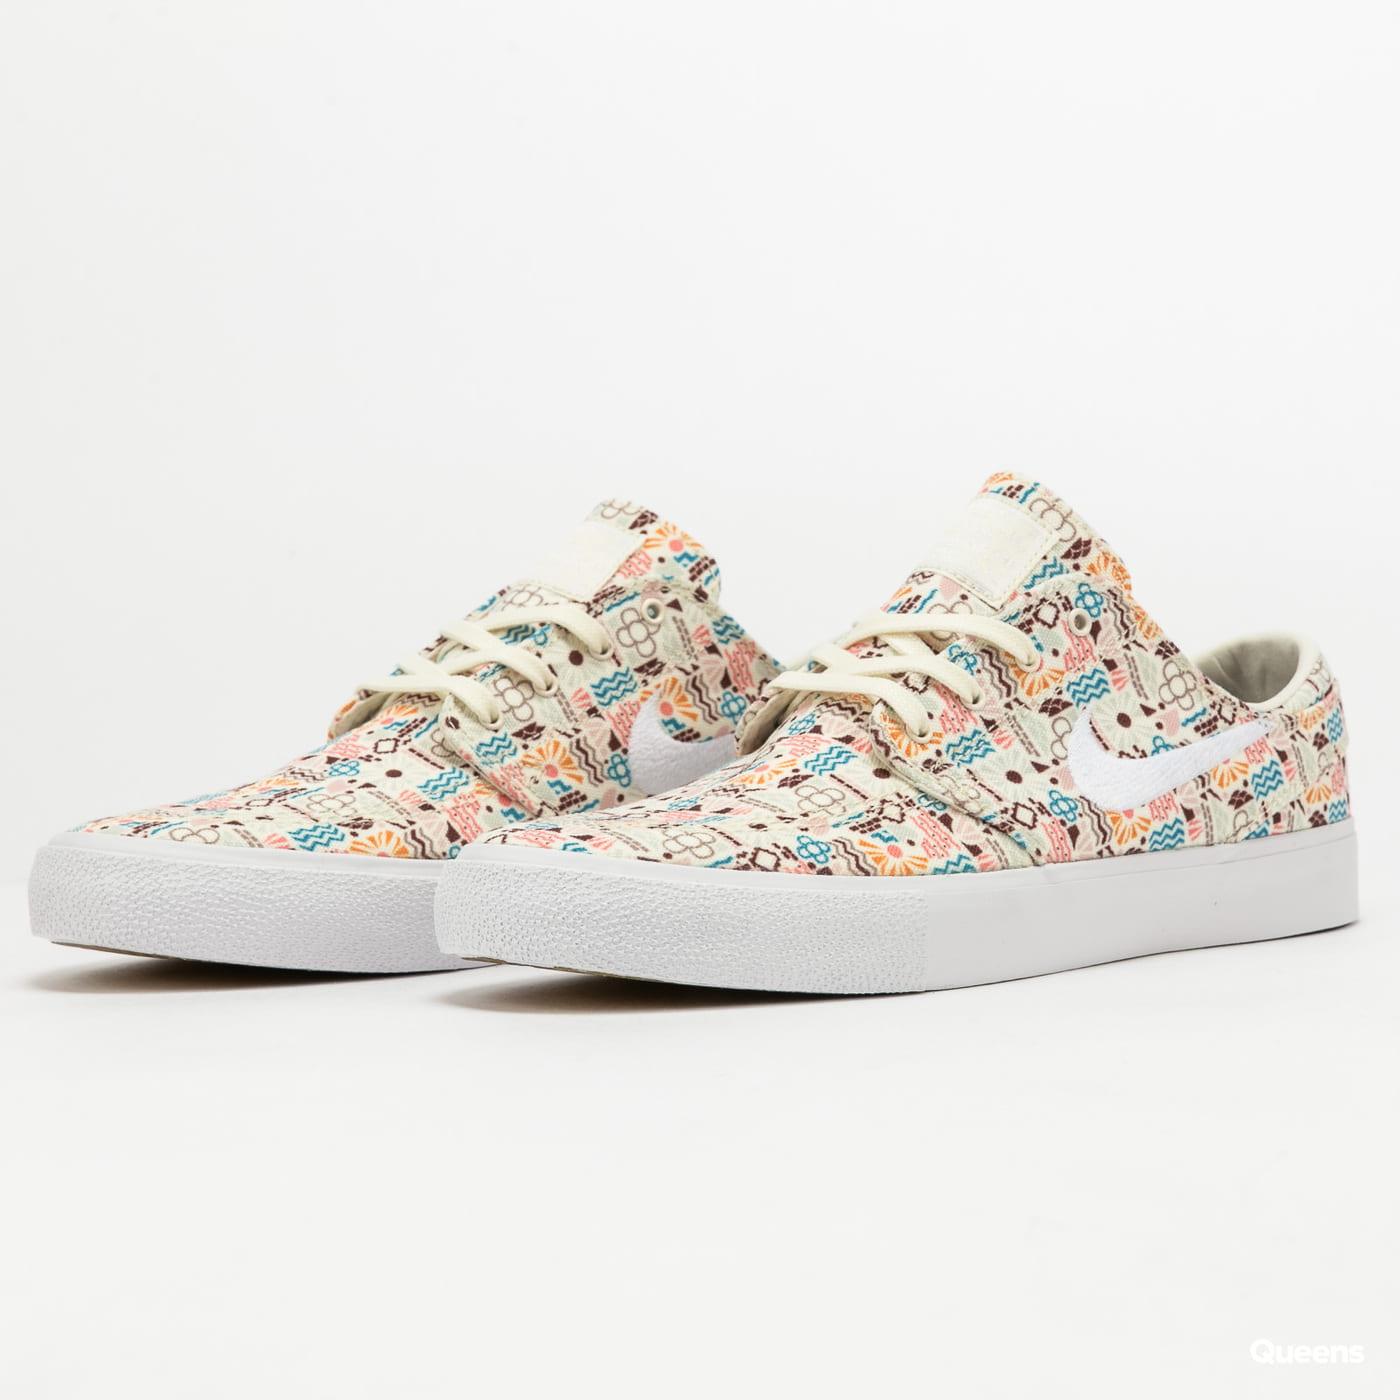 Nike Zoom Janoski Canvas RM Premium cashmere / white - cashmere - white